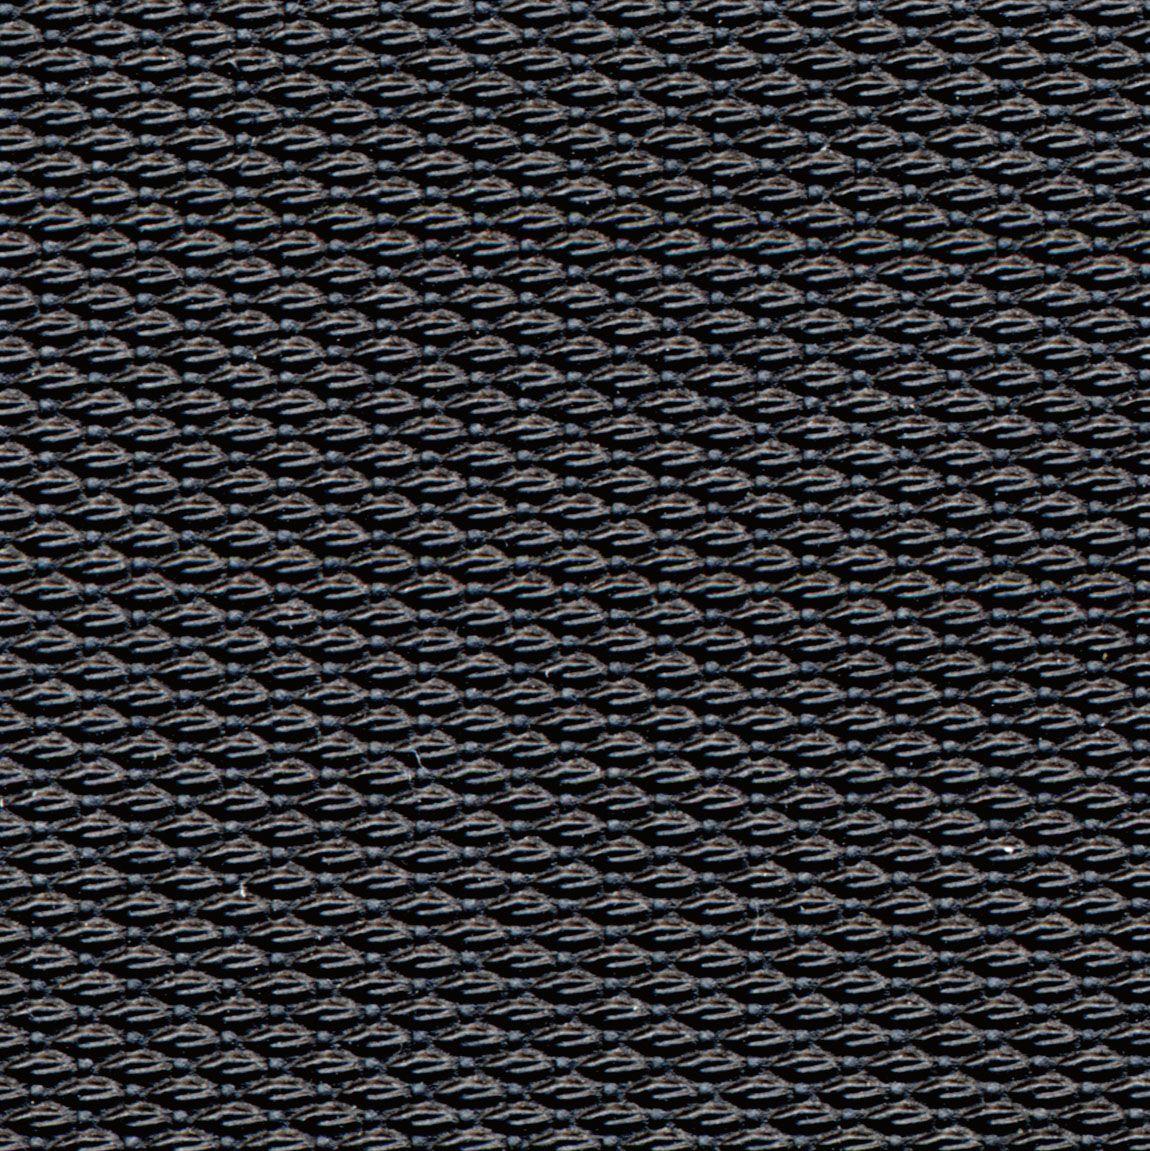 Fabric Diamond Brick Texture Rubber Texture Texture